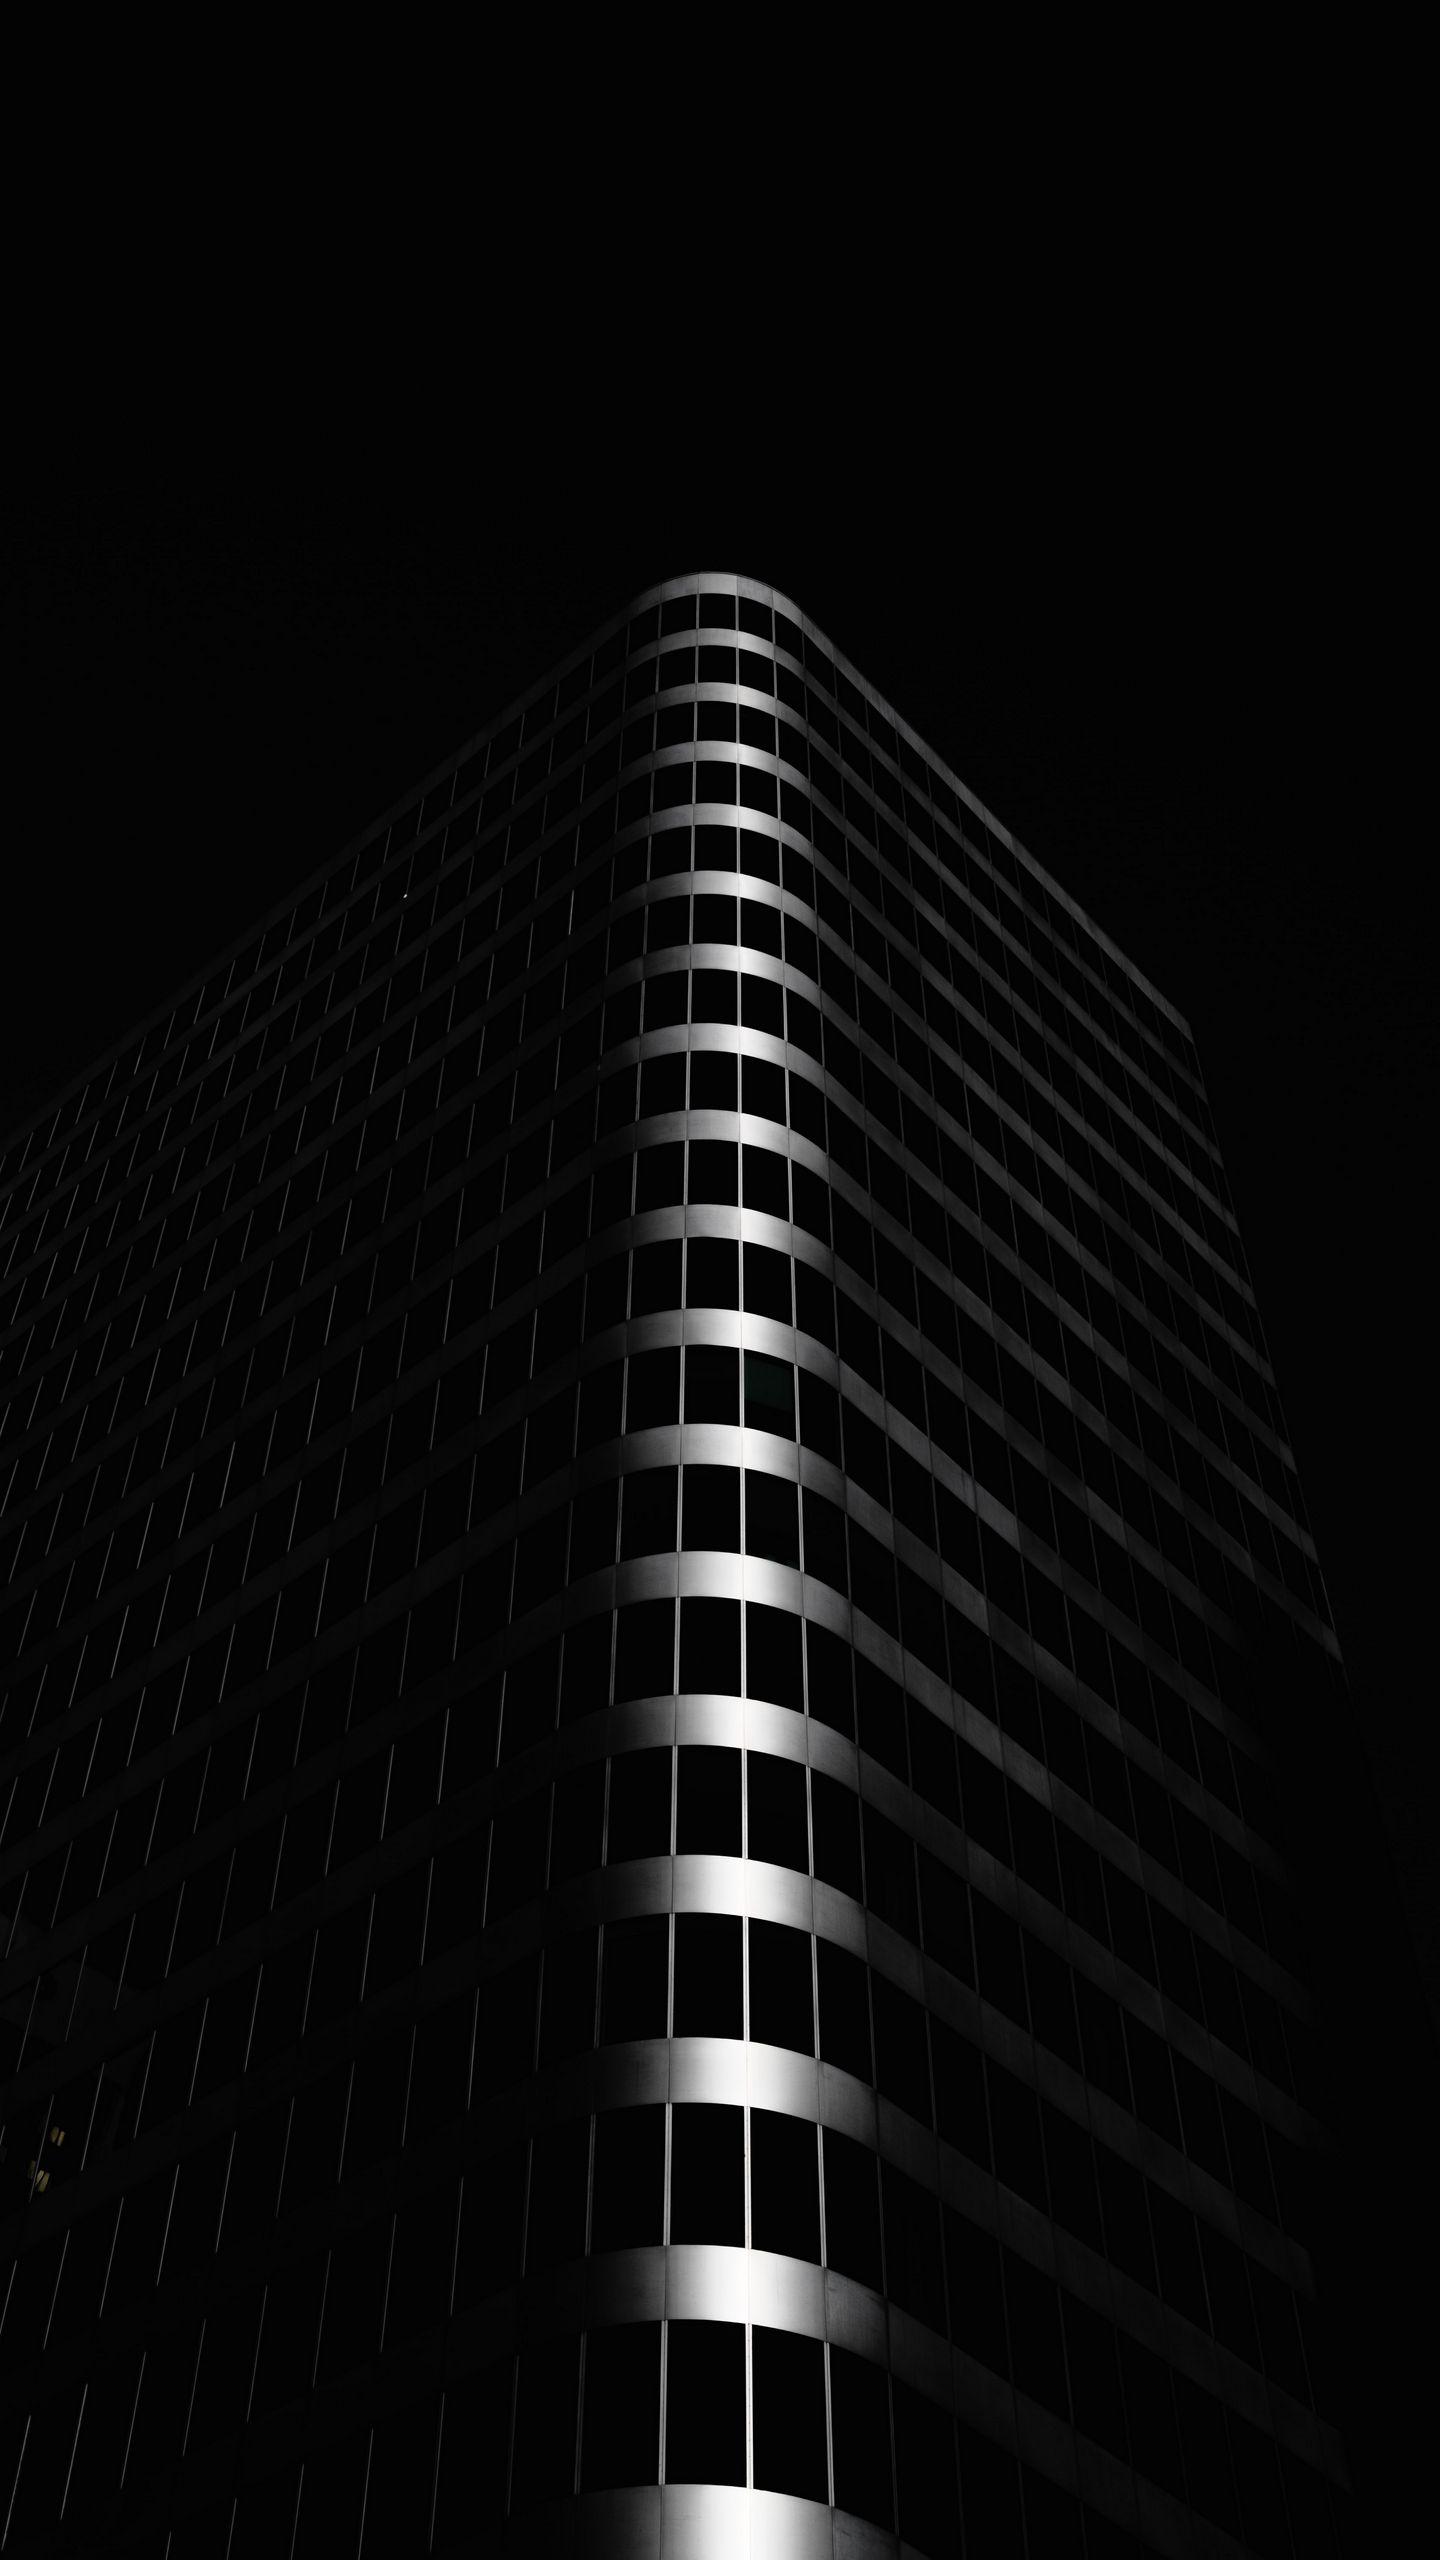 1440x2560 Wallpaper building, architecture, black, dark